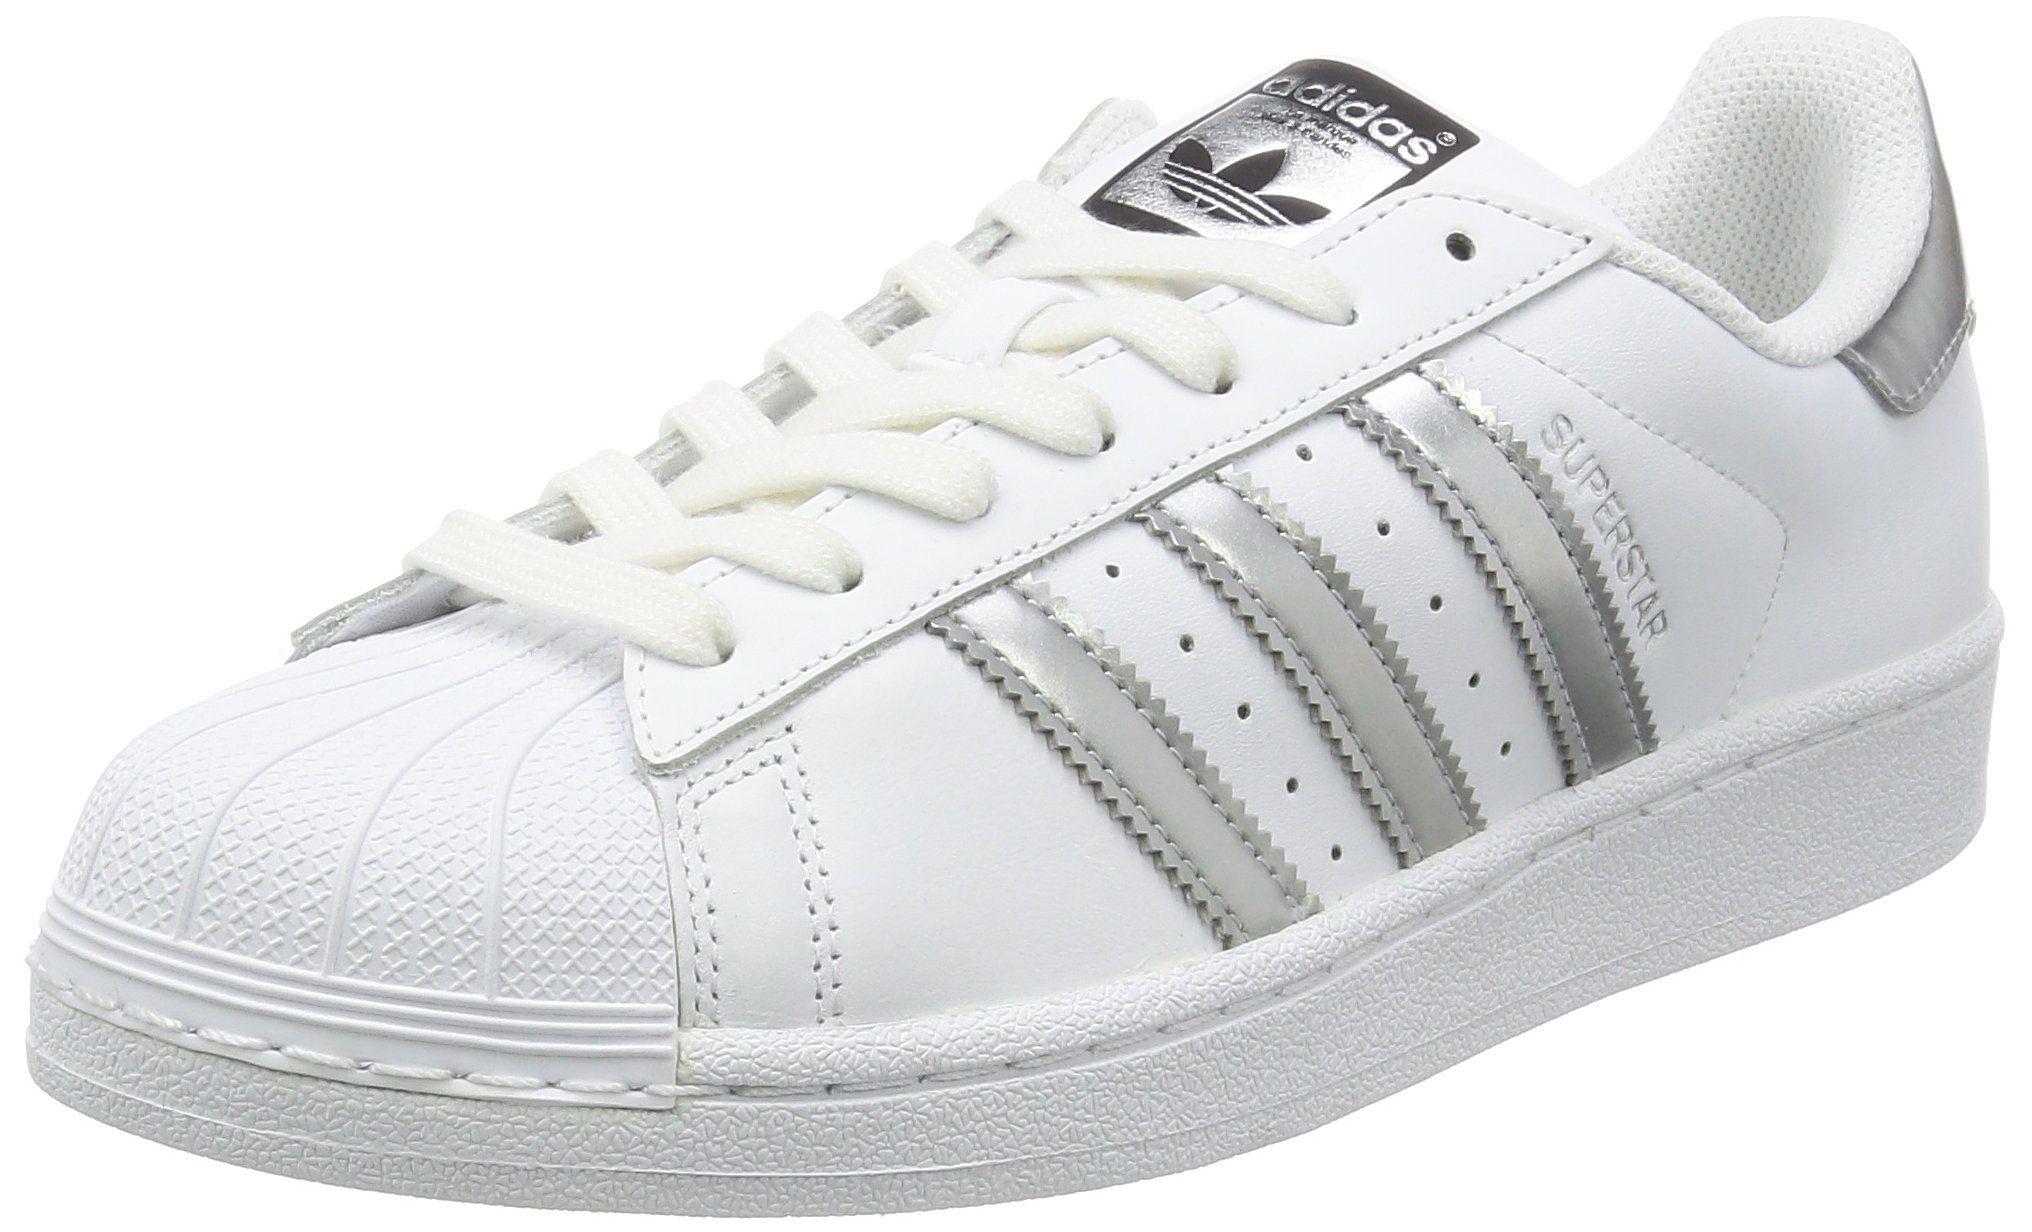 Gratificante Salón principalmente  Adidas Originals Superstar White/Silver Leather 7 B(M) US Women. Model  Number: AQ3091. Gender: w… | Adidas superstar women, Adidas originals  superstar, Adidas women